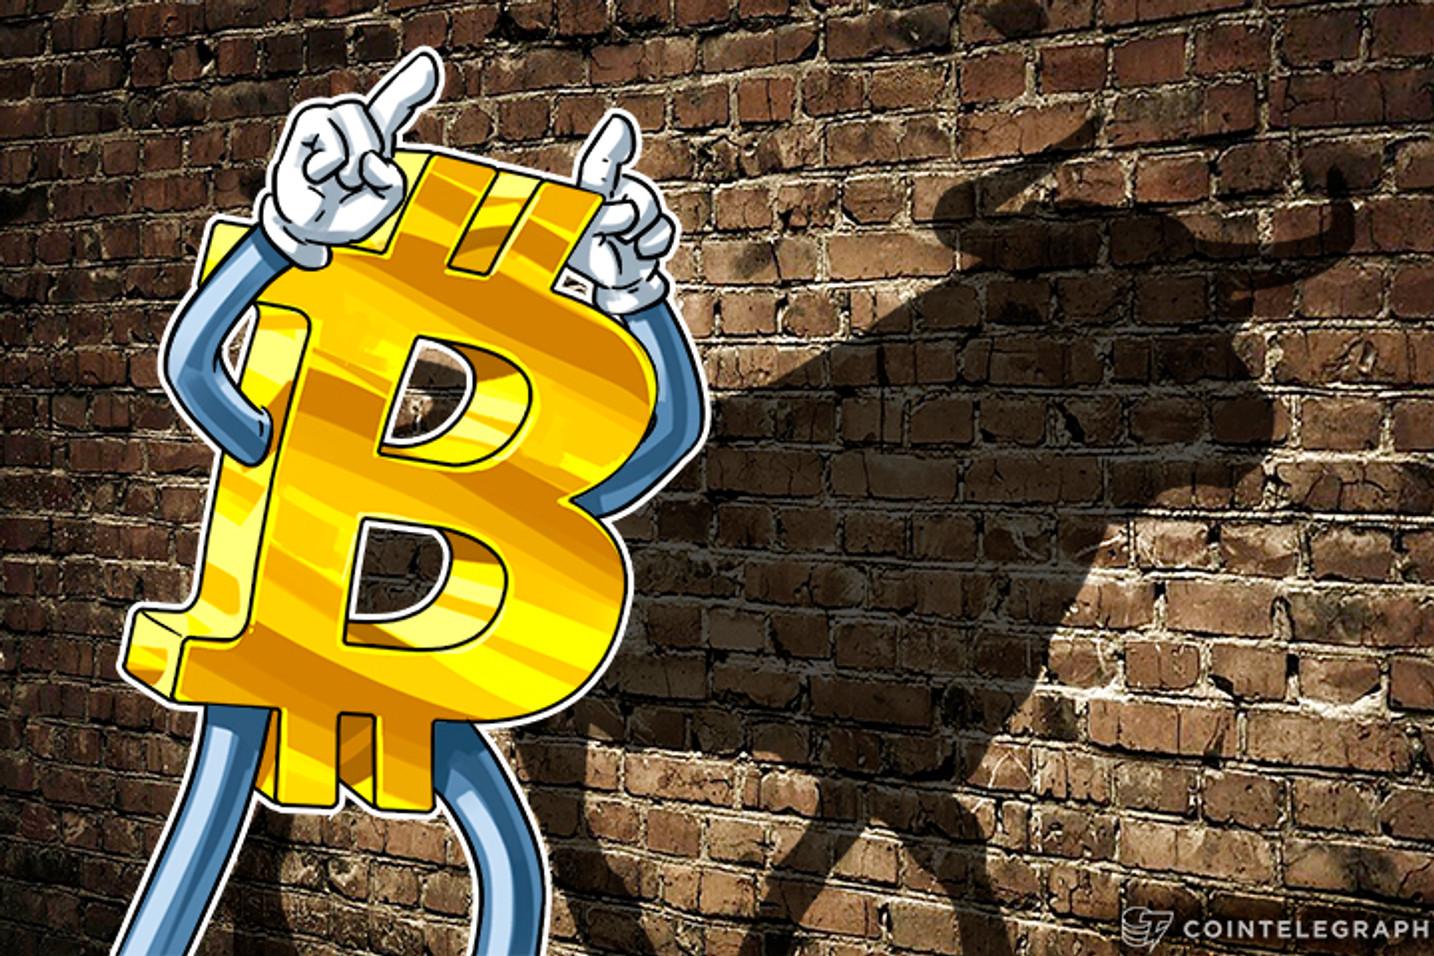 Despite Volatility Bitcoin Price Remains Bullish in the Long Run